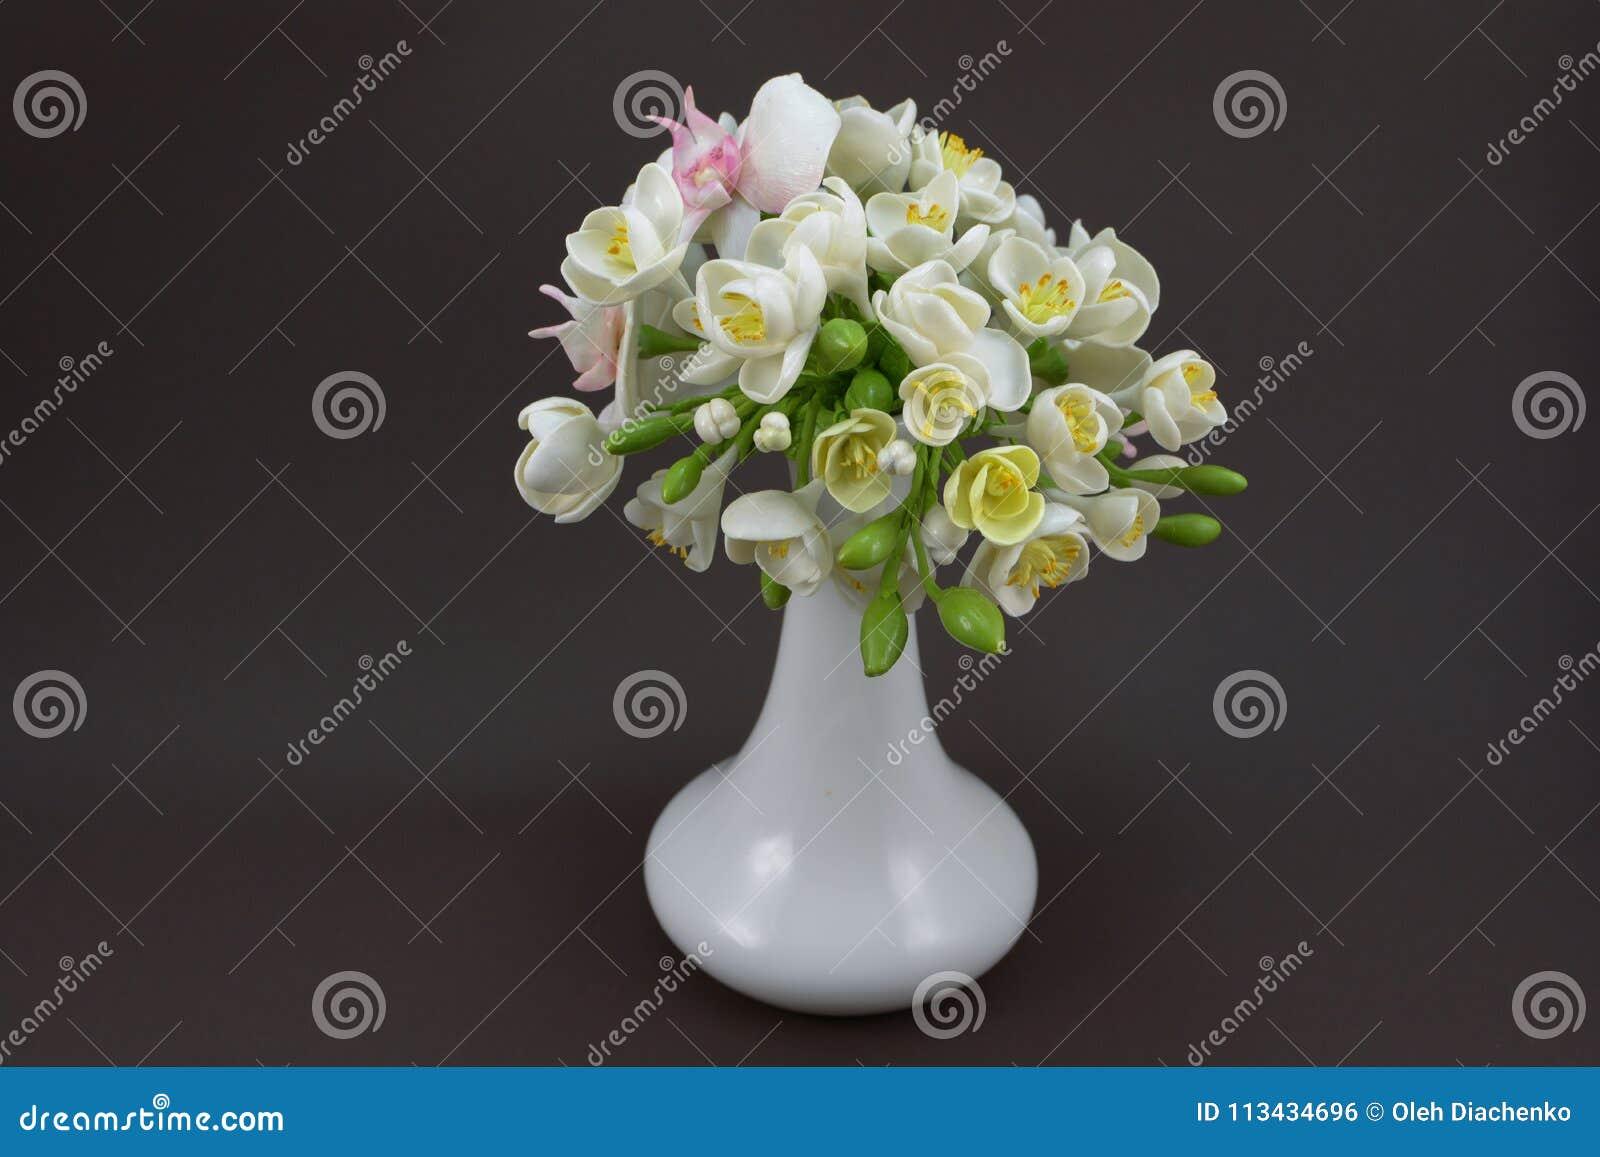 Hand made polymer clay flower bouquet in a white vase on a dark download hand made polymer clay flower bouquet in a white vase on a dark stock photo izmirmasajfo